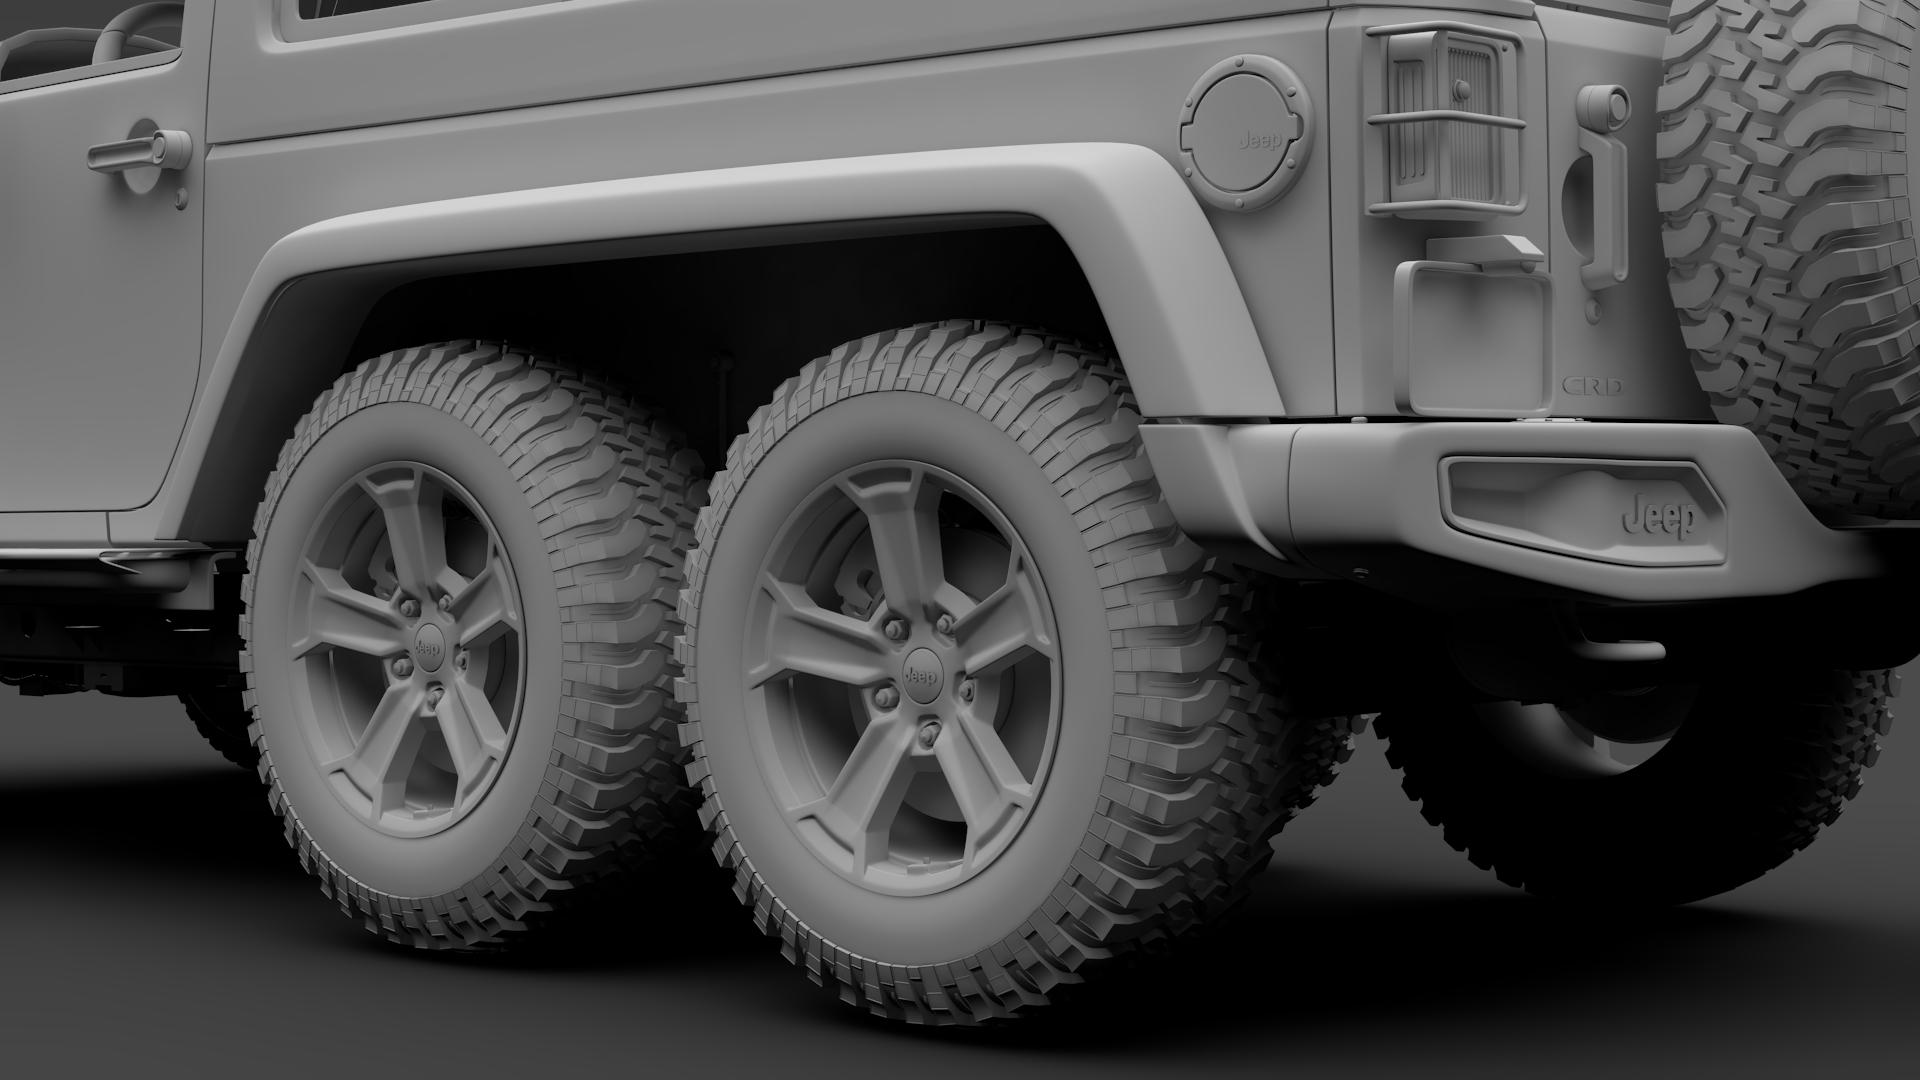 jeep wrangler 6×6 rubicon recon jk 2017 3d model max fbx c4d lwo ma mb hrc xsi obj 276860